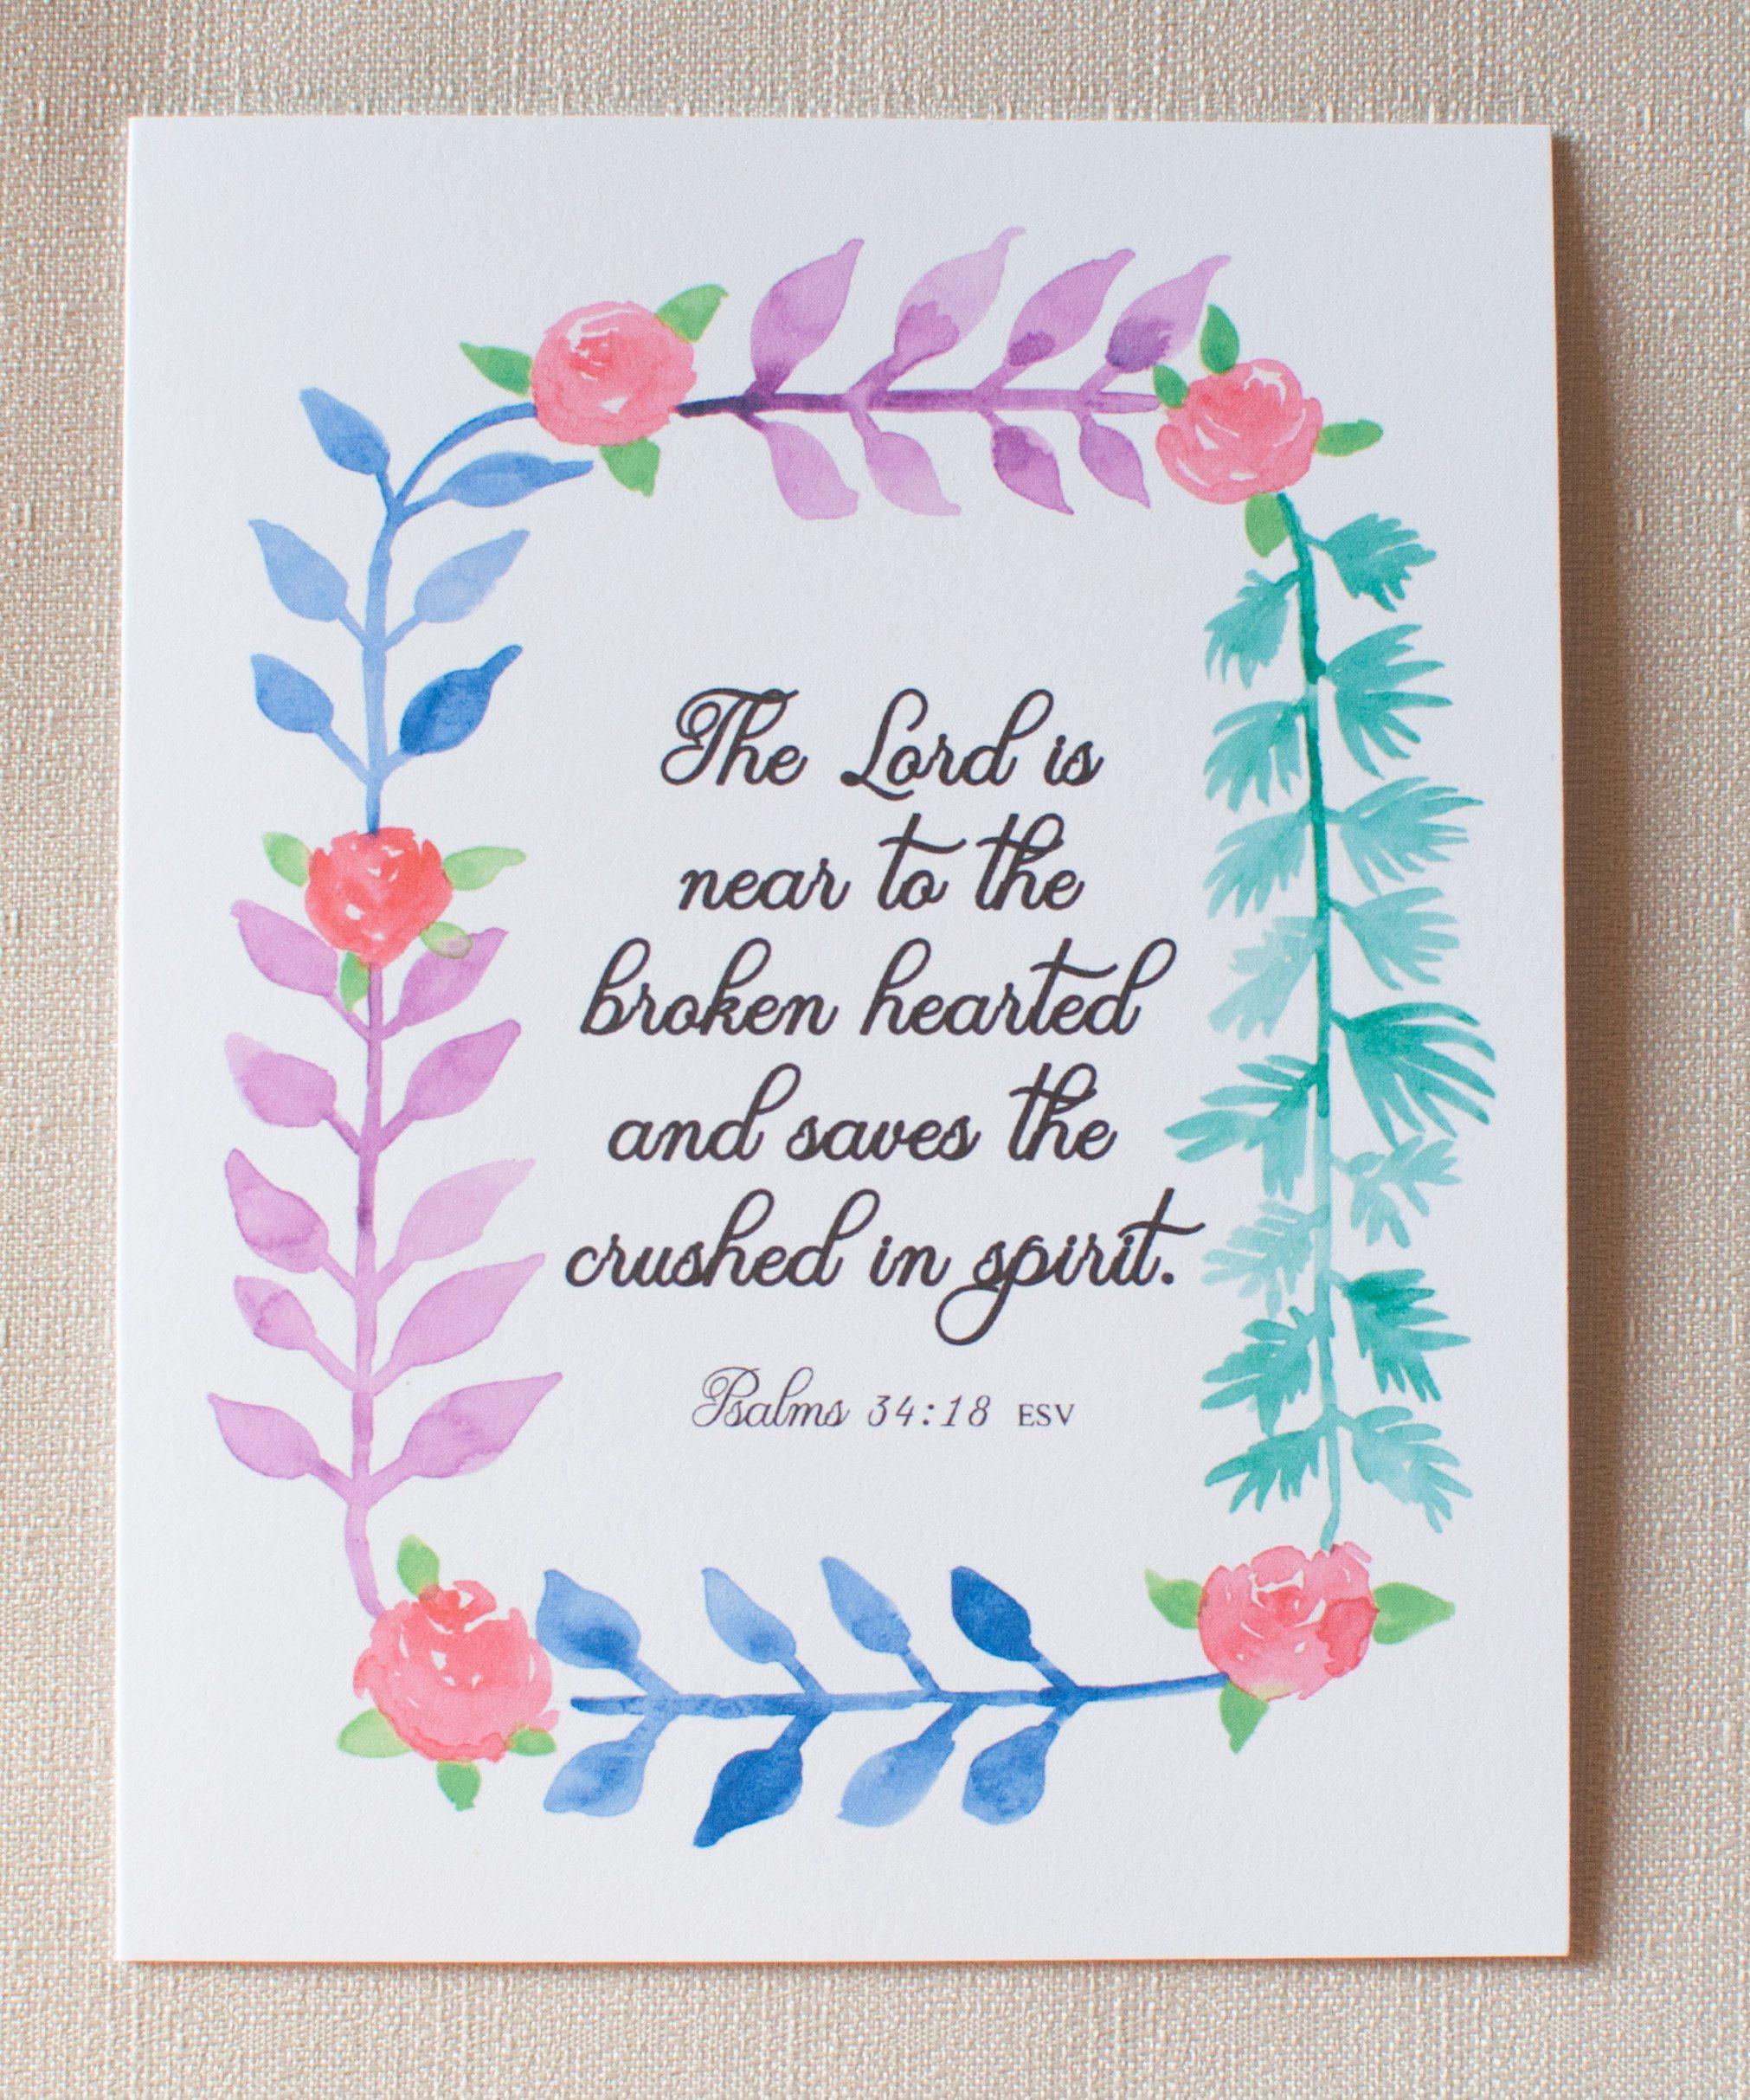 Terrific Examples Of Free Printable Sympathy Condolence Cards For - Free Printable Sympathy Cards